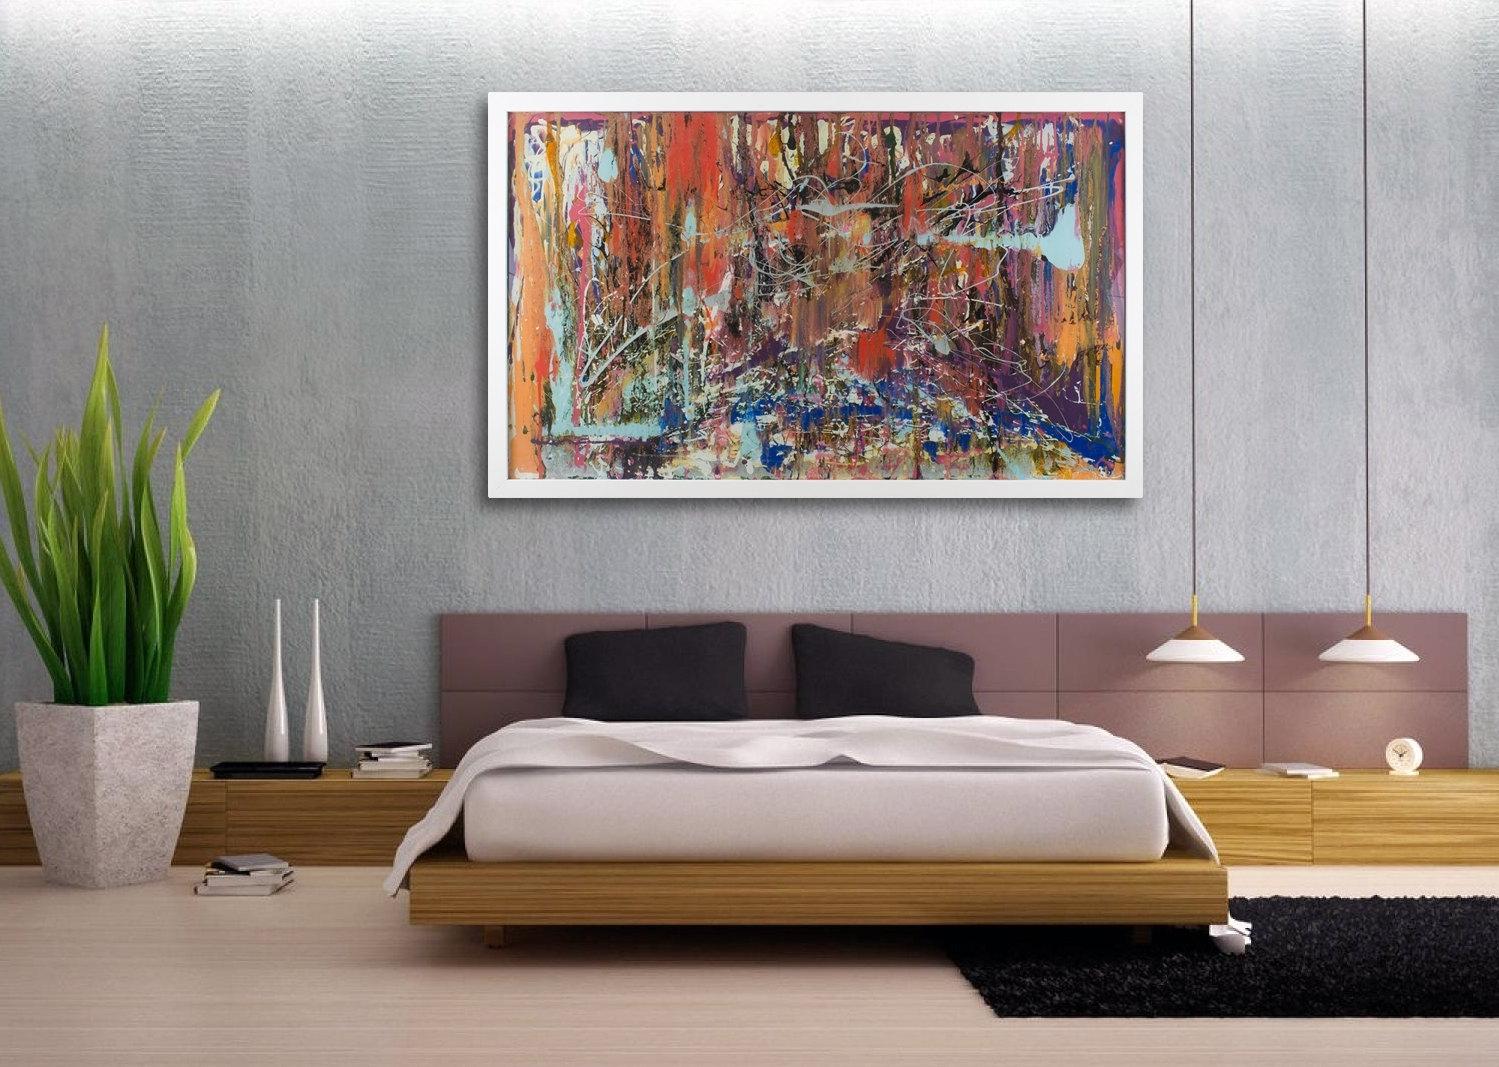 Large Wall Art Ideas #15763 | Idaho Interior Design with regard to Big Wall Art (Image 17 of 20)